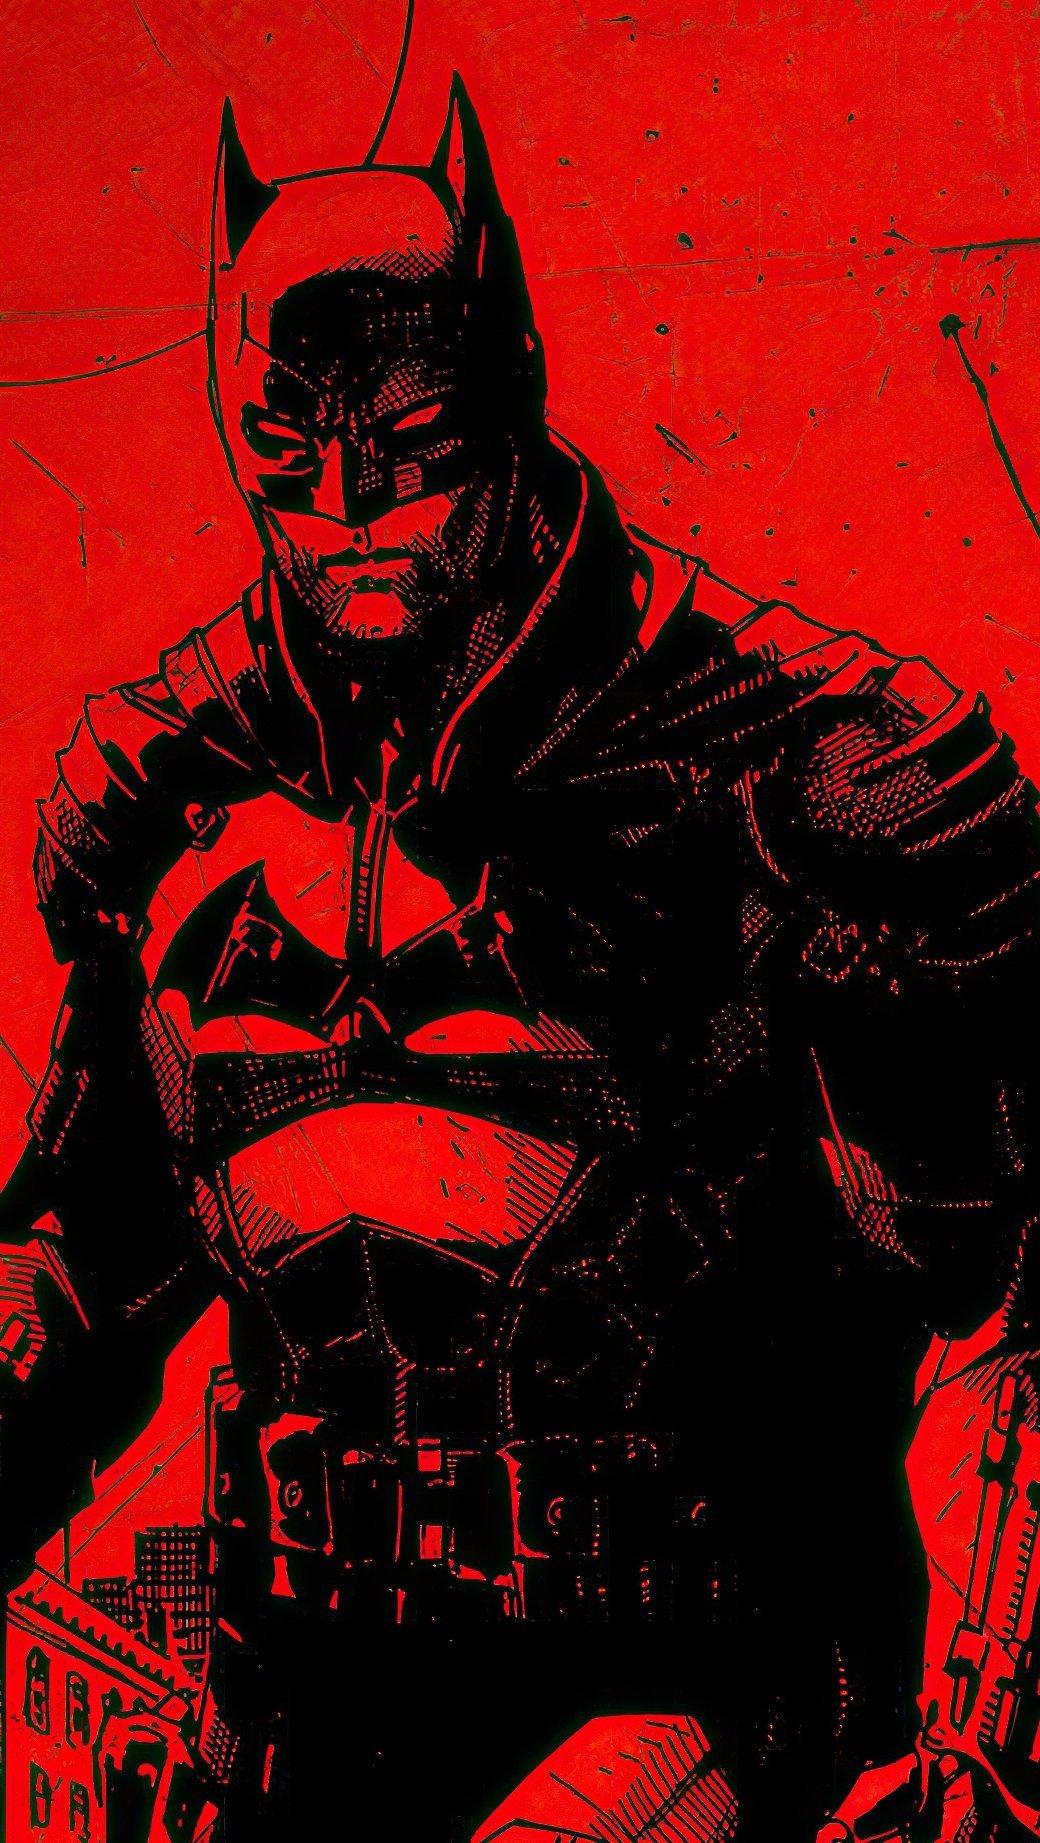 Wallpaper The Batman 2021 Movie Vertical